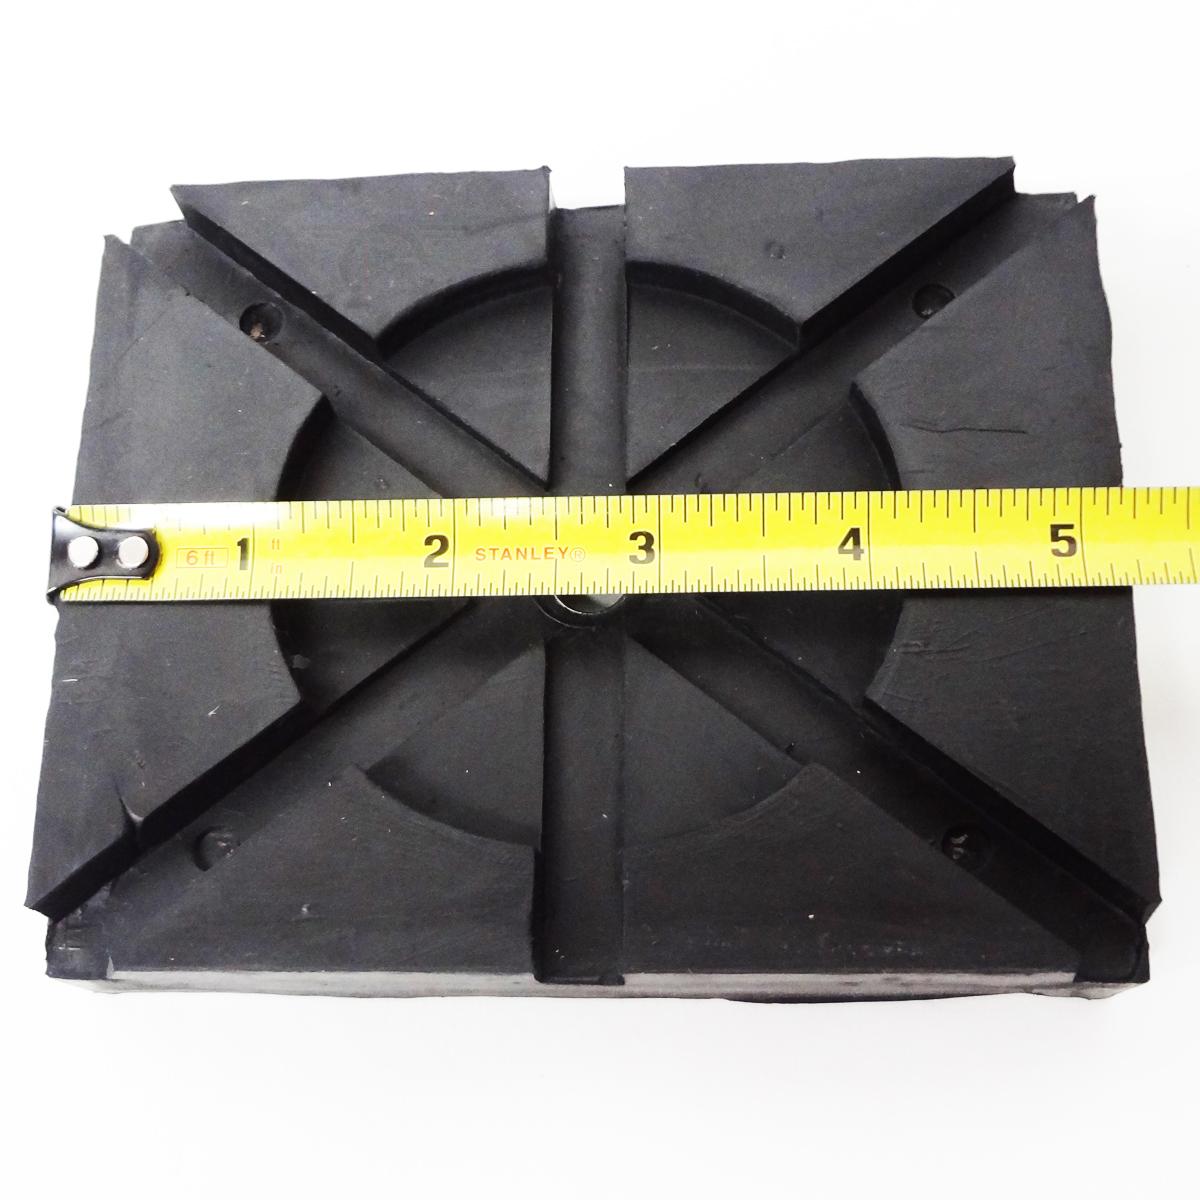 Pictures of Wheeltronics 2 Post Lift